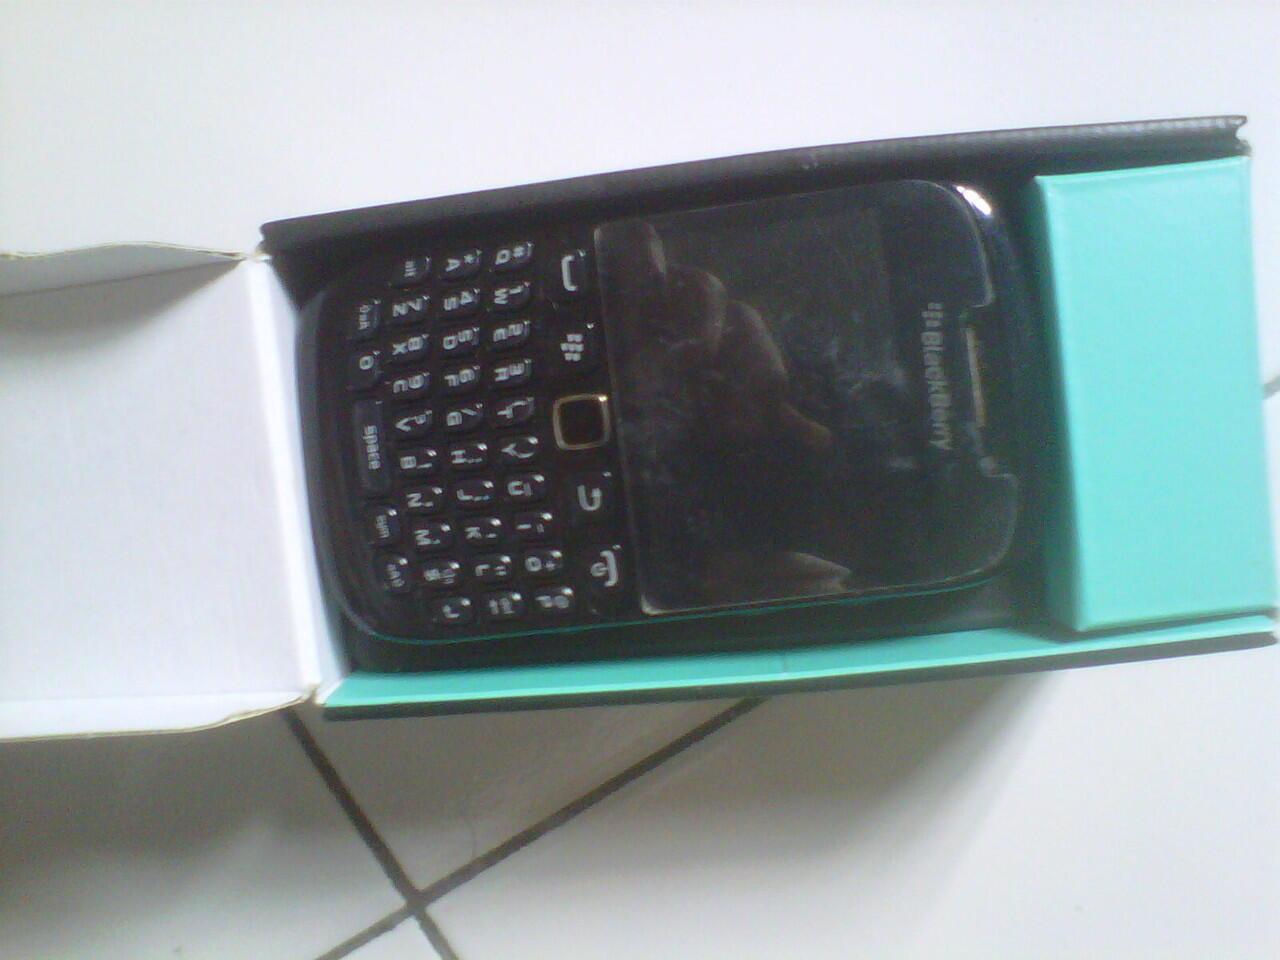 Jual Blackberry 9220 Mati Masuk Air